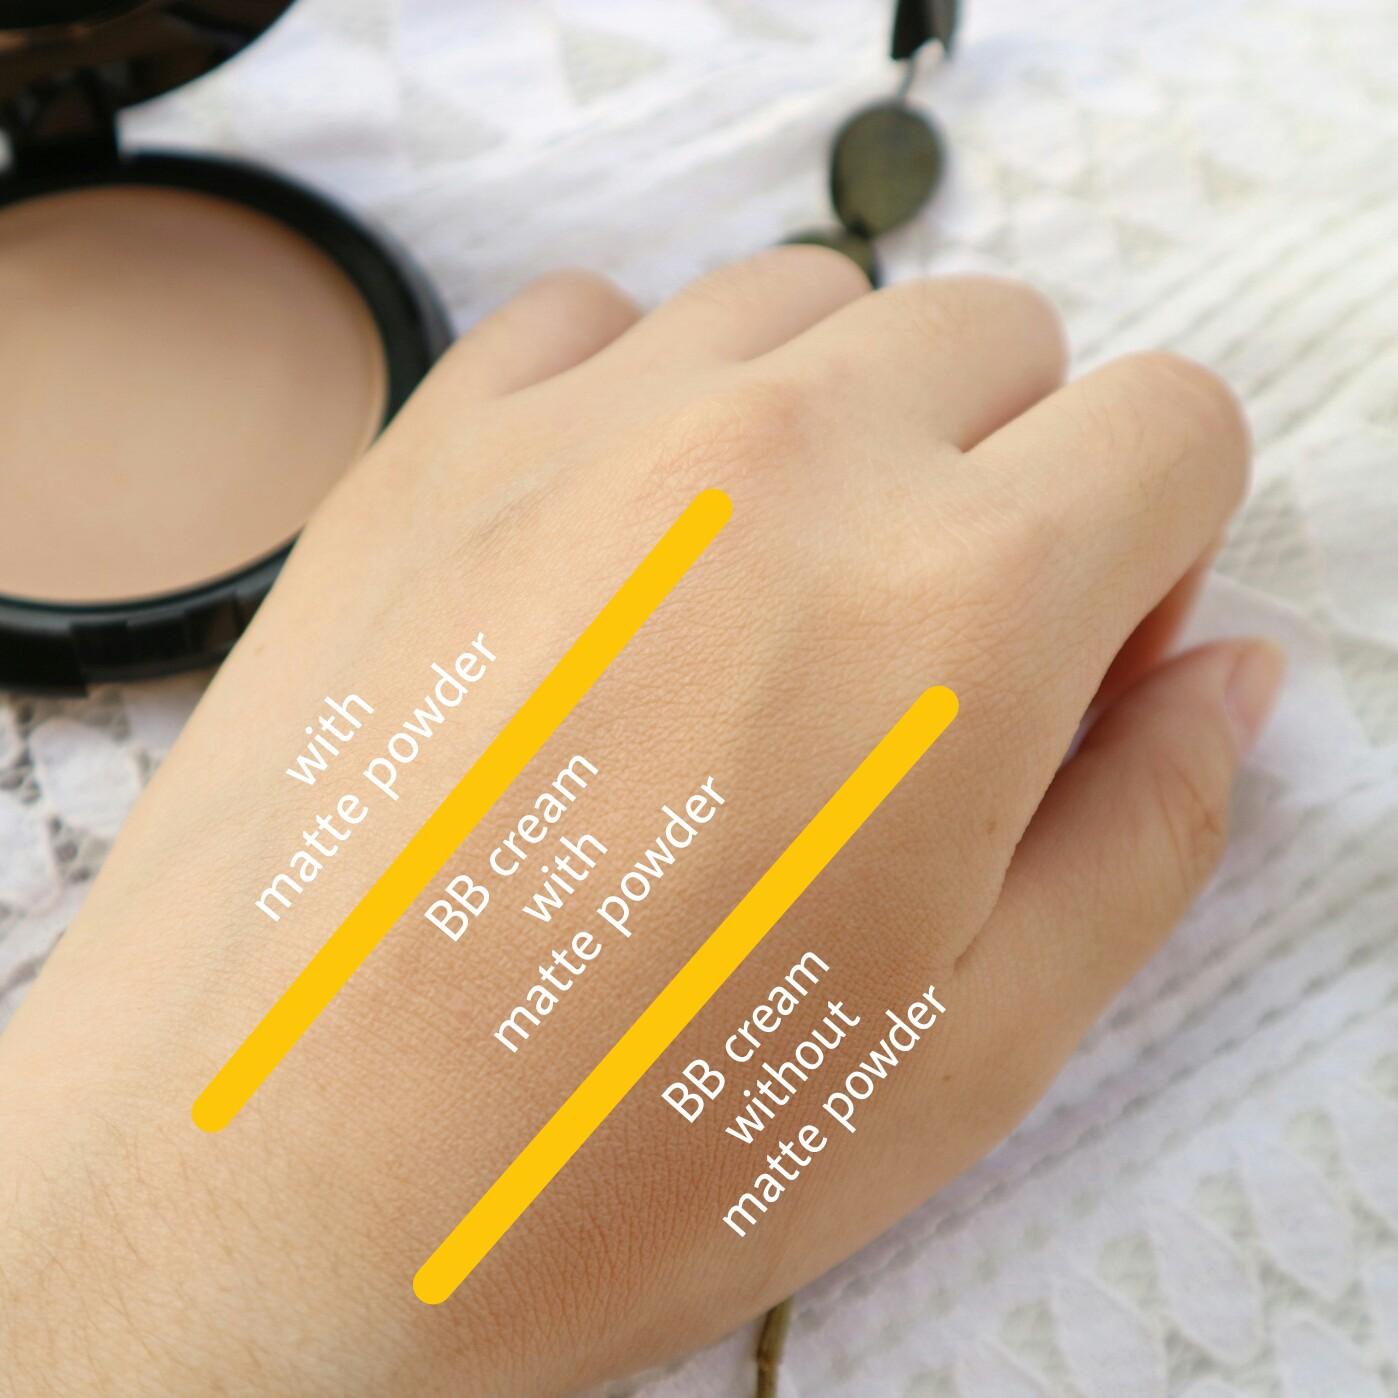 Purbasari Hydra Series Bb Cream Oil Control Matte Powder Brightening Cool 35ml Review